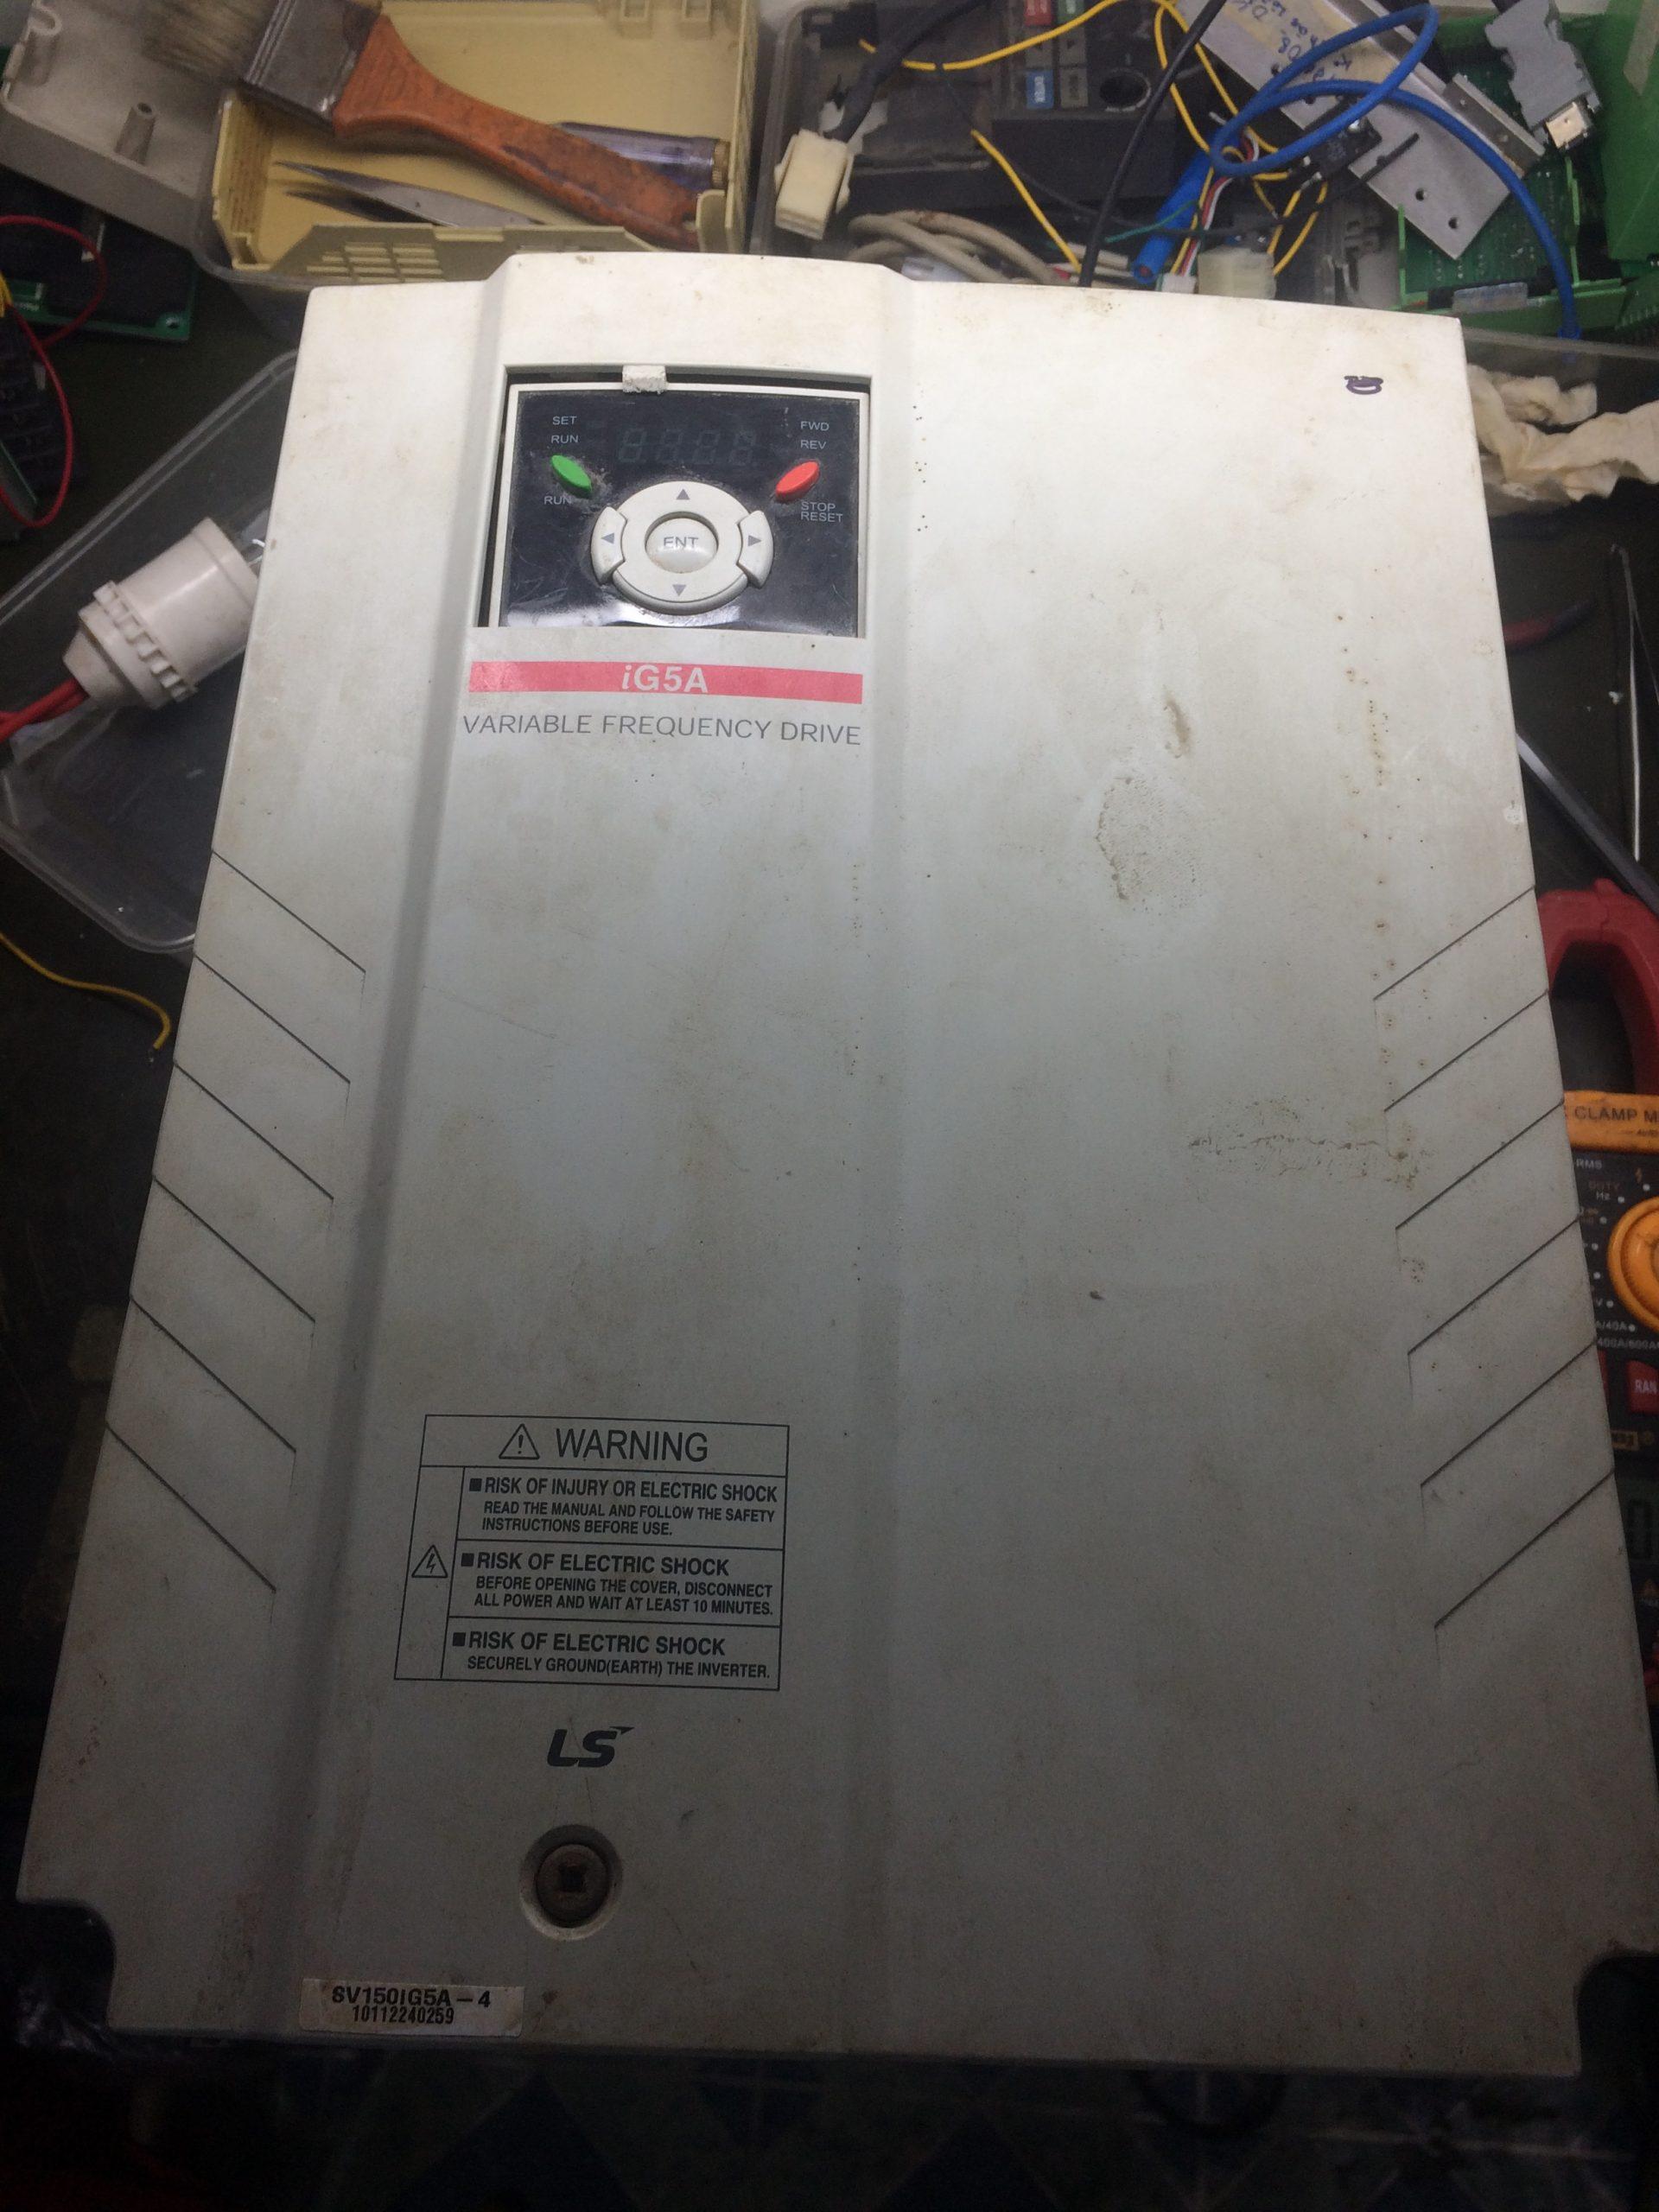 Biến tần LS 15kW Model: SV150iG5A-4 Serial: 0259